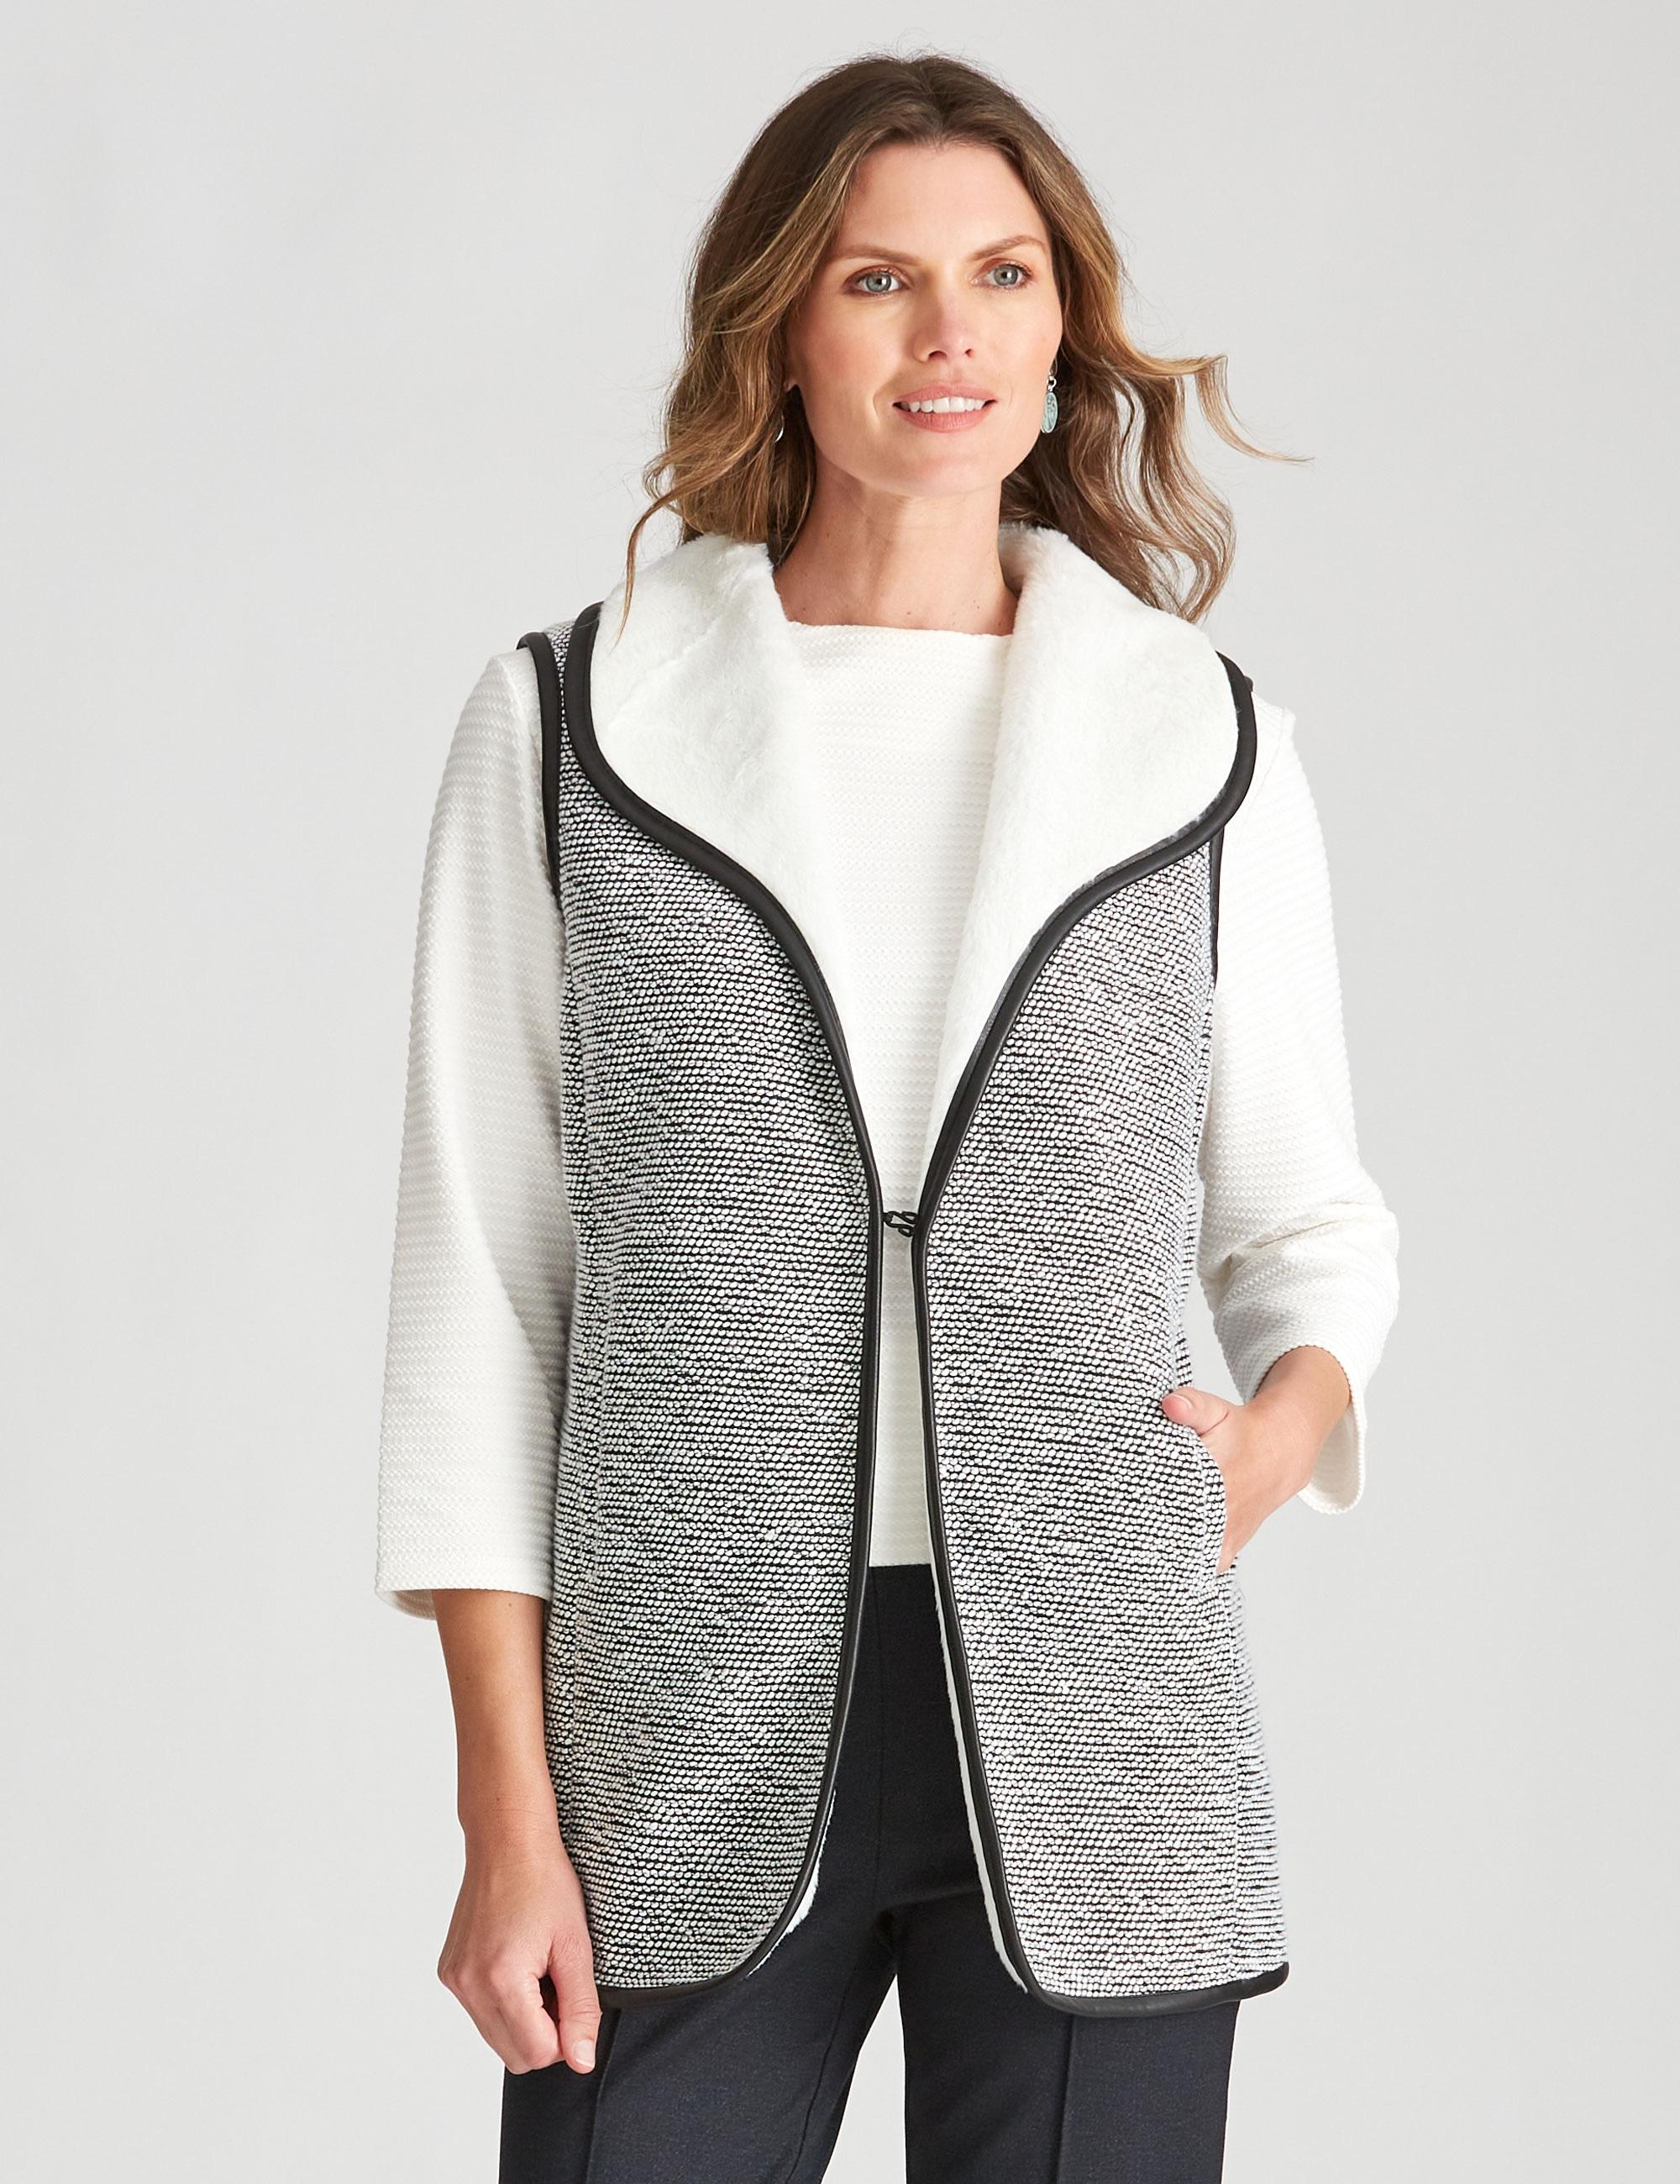 1051910001 1 - Women Fashion